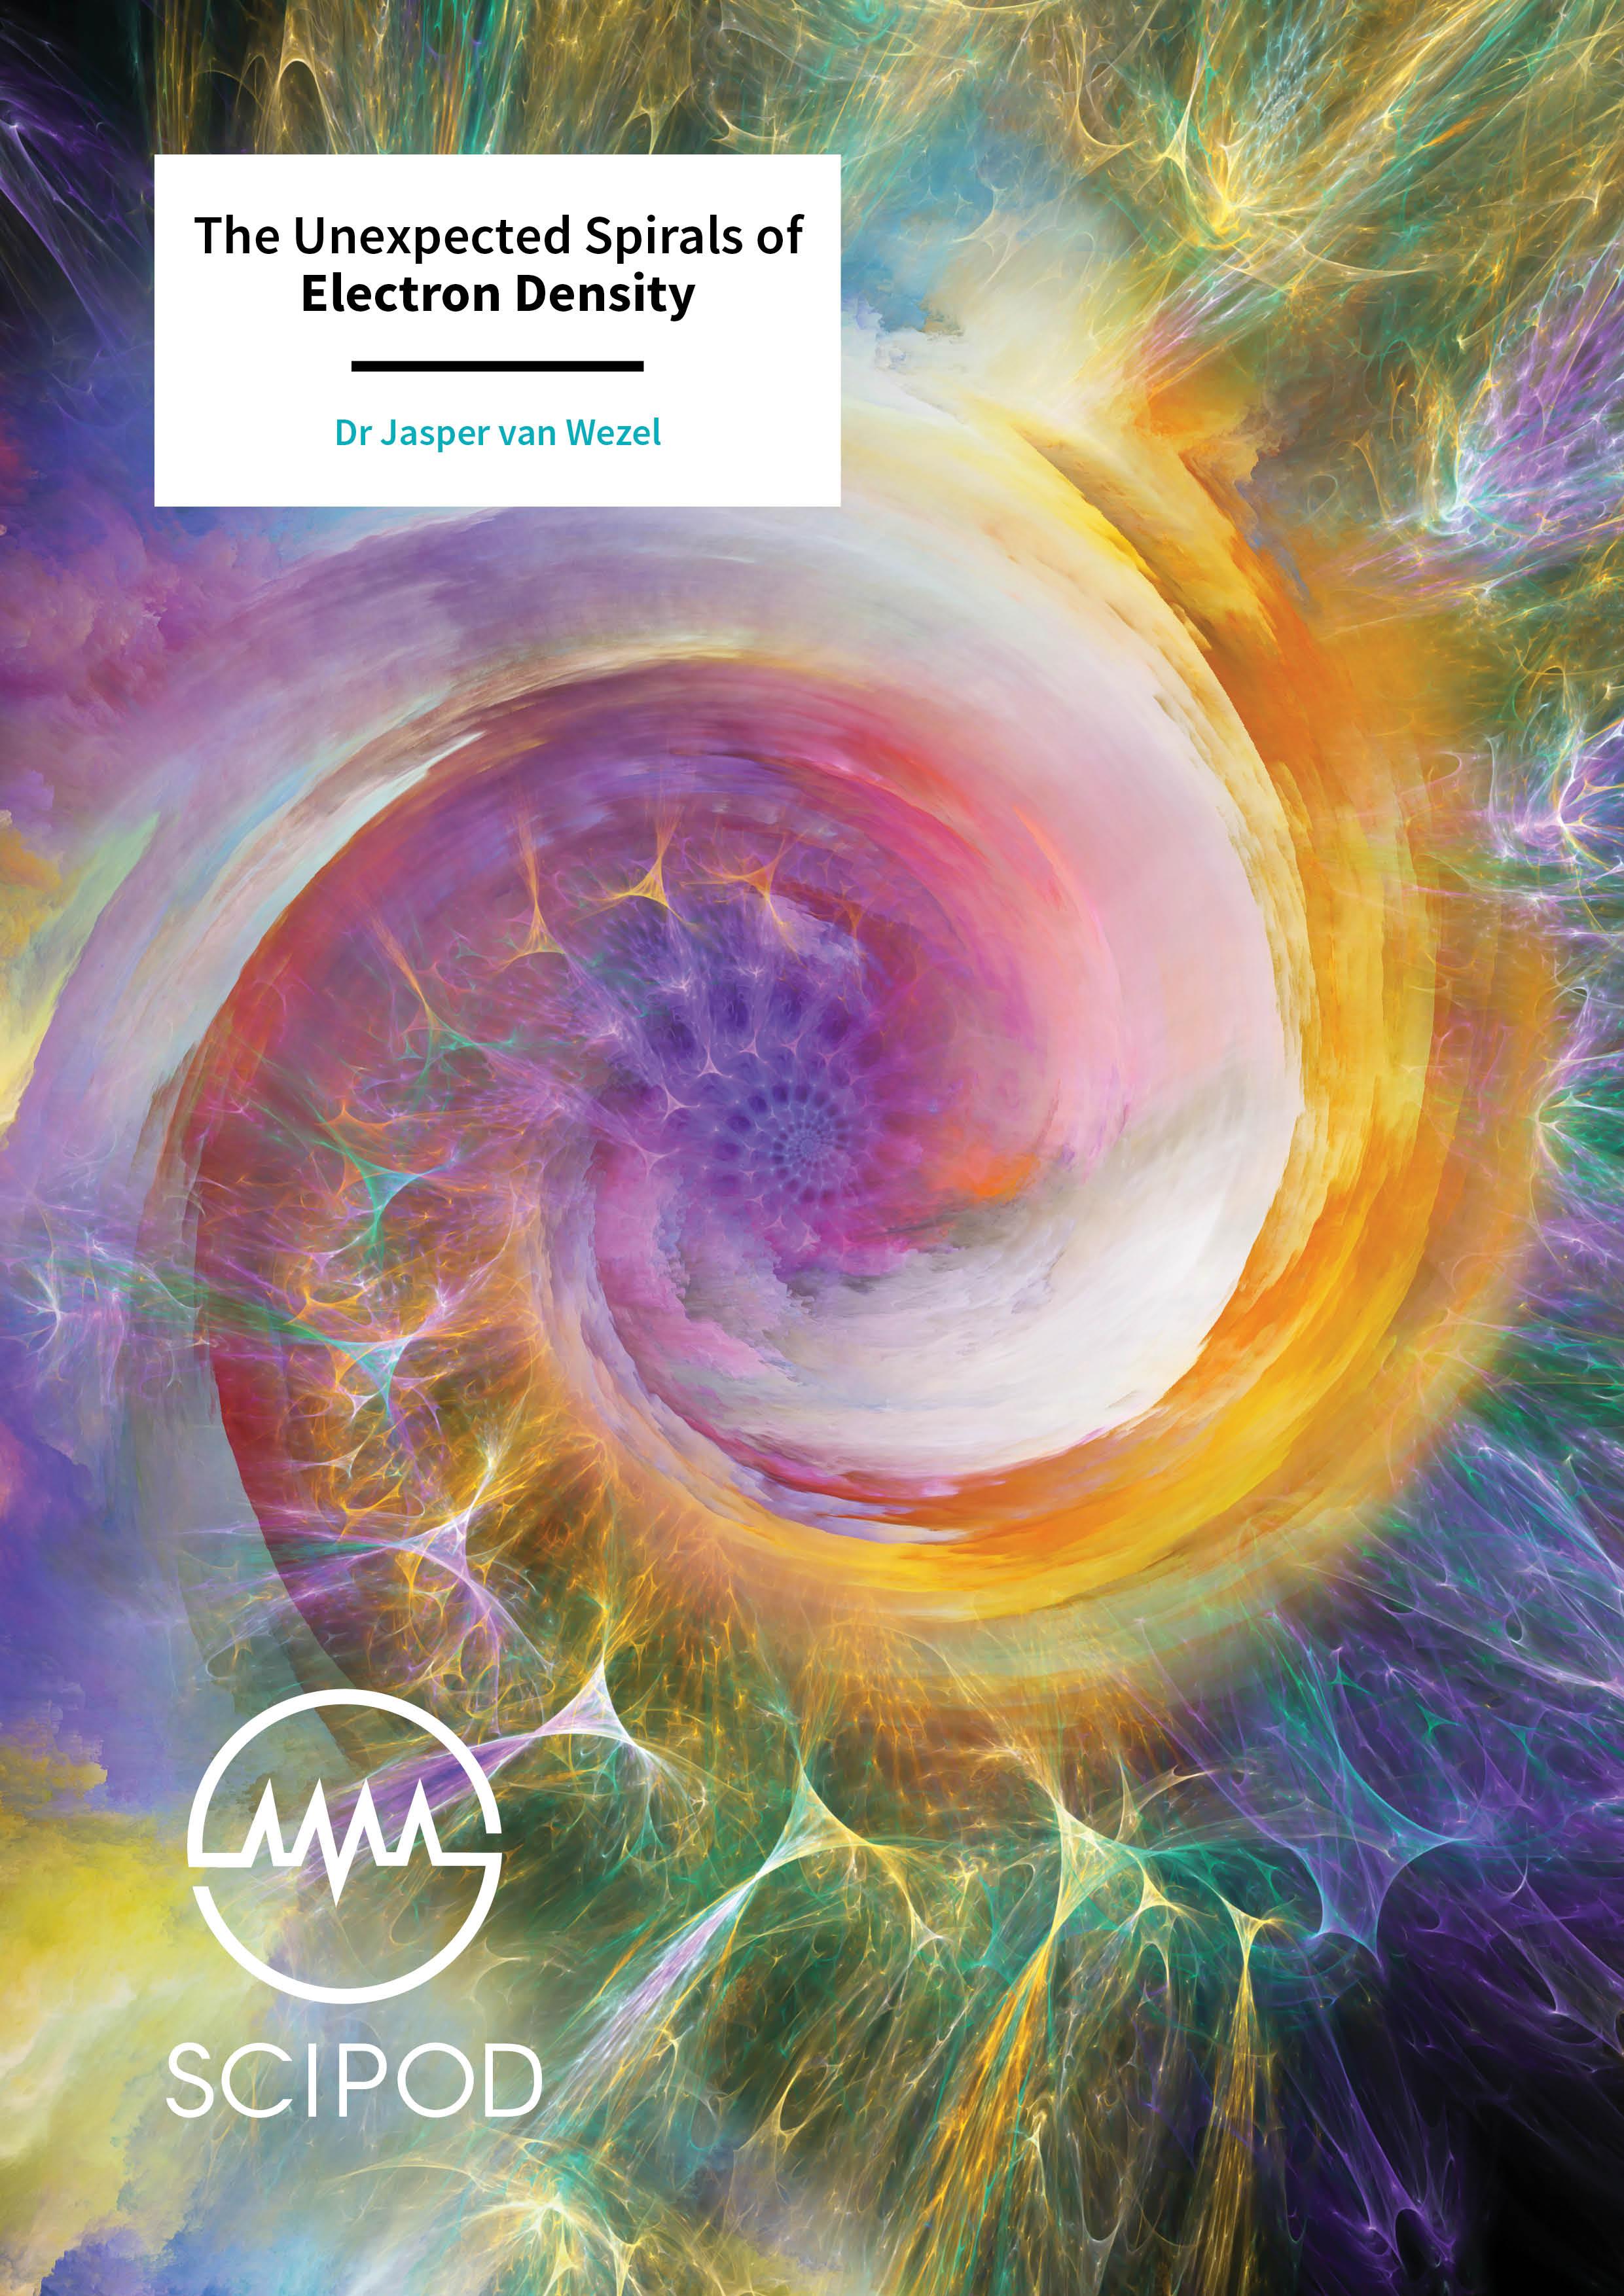 Scipod - The Unexpected Spirals of Electron Density – Dr Jasper van Wezel, University of Amsterdam